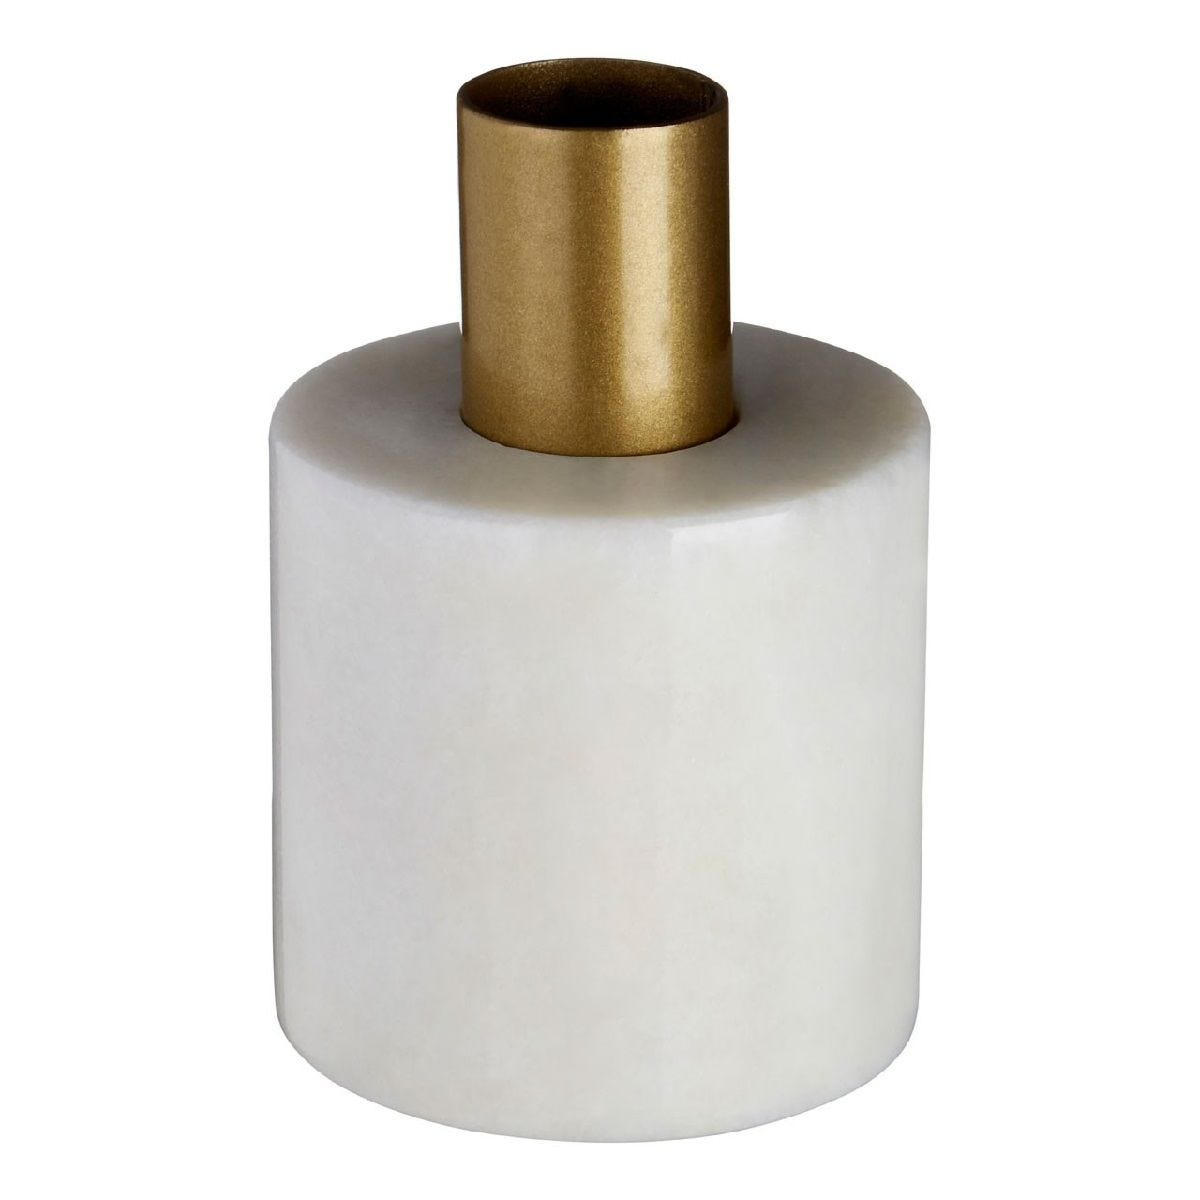 Premier Housewares Lamonte Candle Holder - White Marble